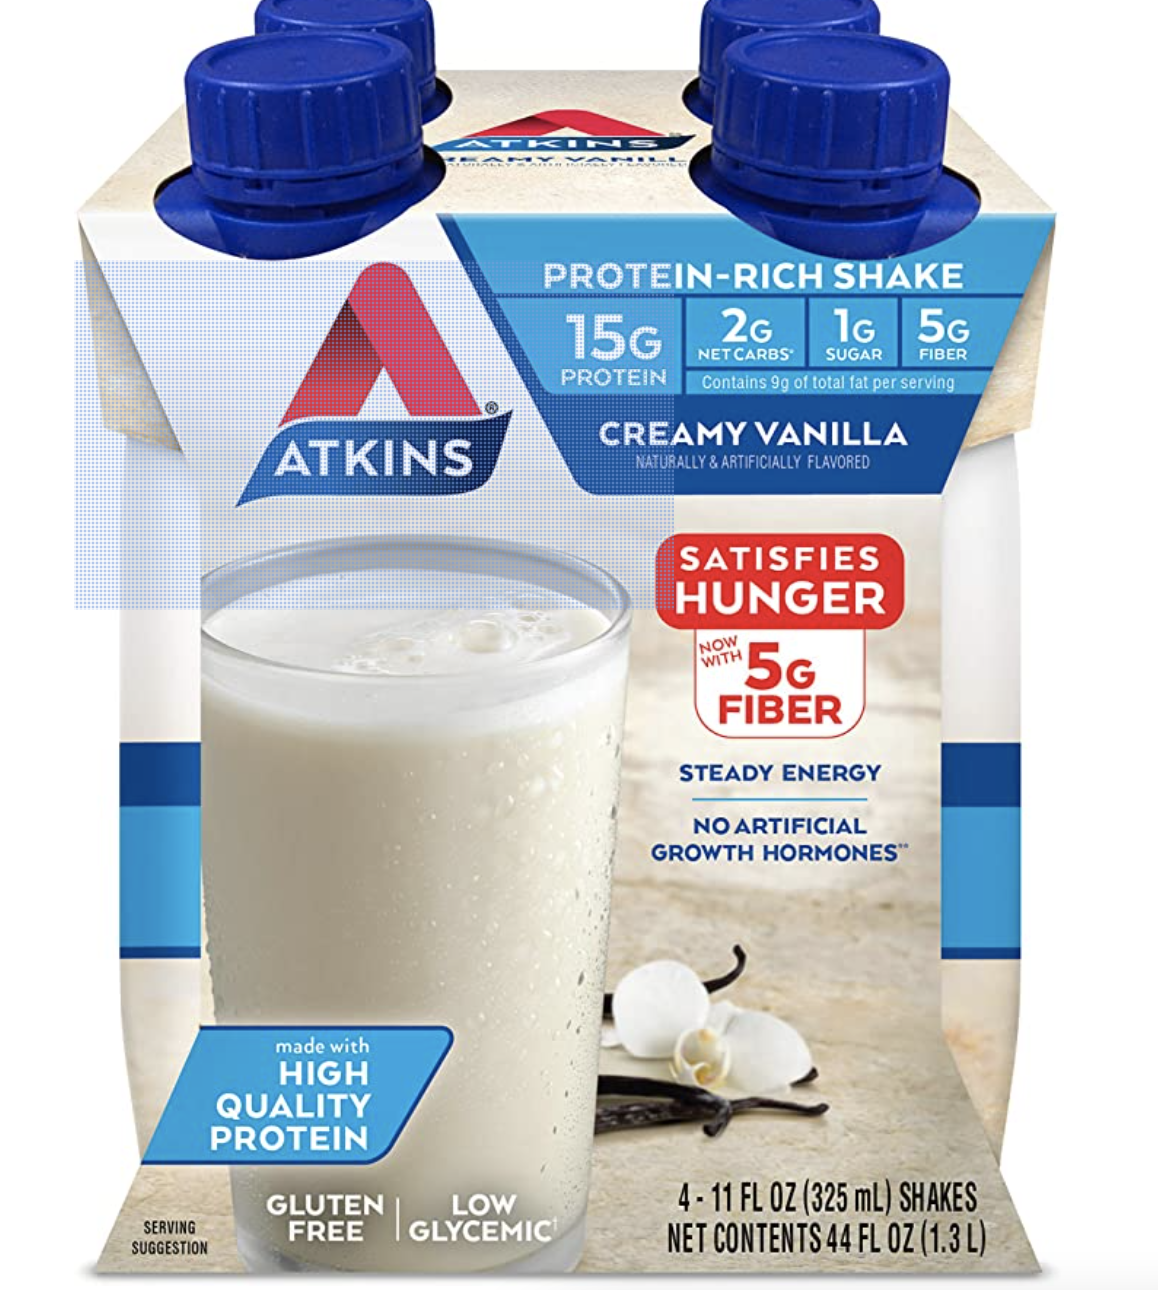 Atkins Creamy Vanilla Protein Shake